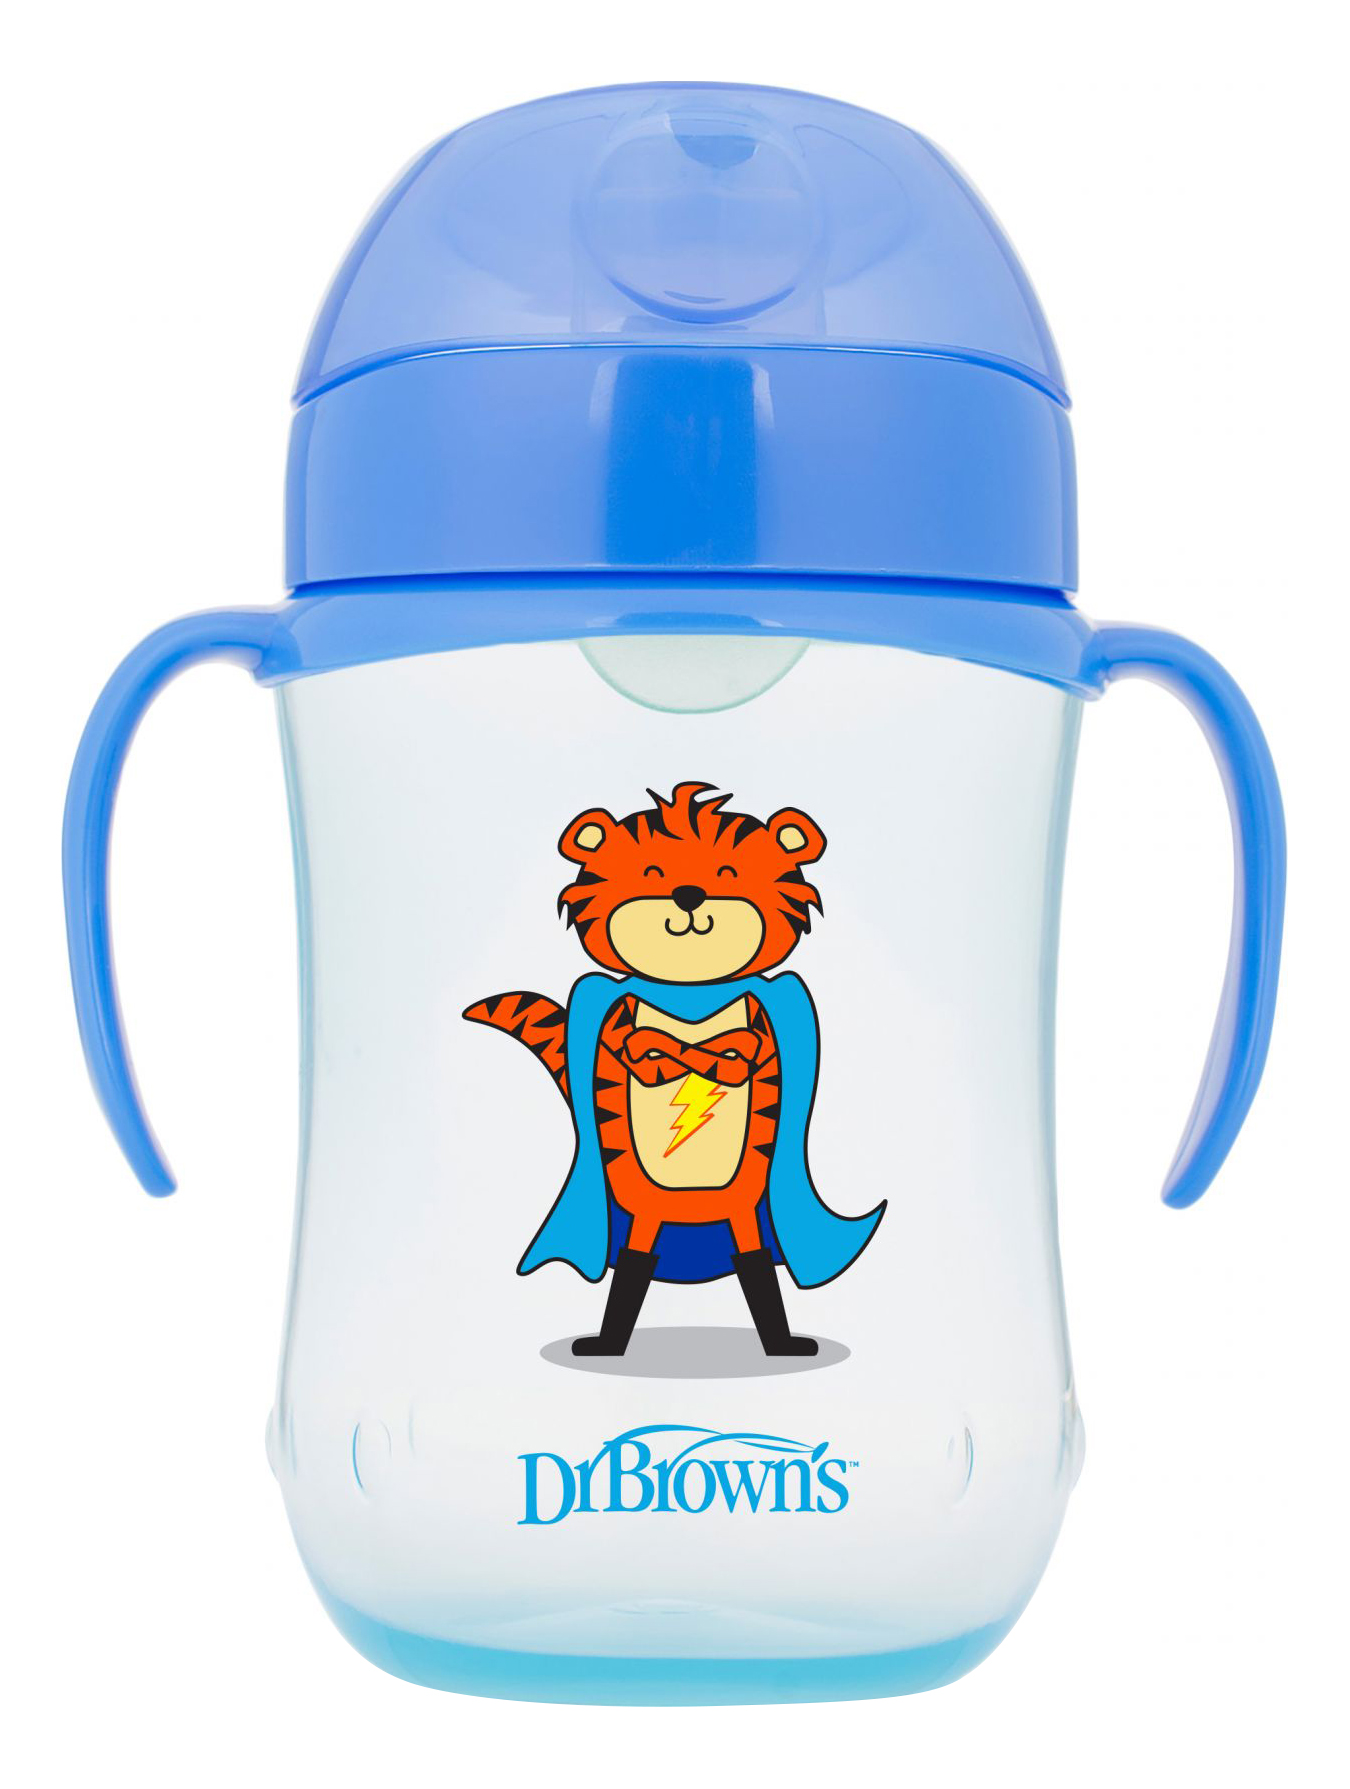 Купить 270 мл синий, Поильник Dr.Brown чашка с мягким носиком 270 мл (с 9 мес) синий, Dr. Brown's, Поильники